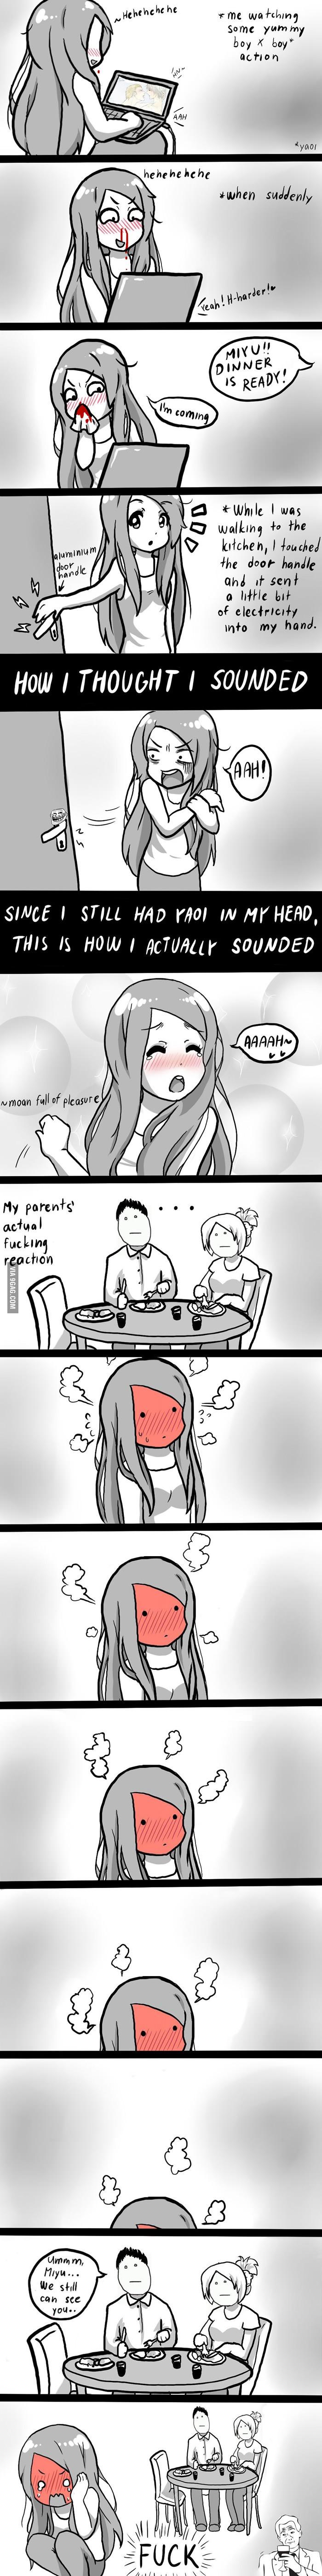 That Awkward Moment - 9GAG